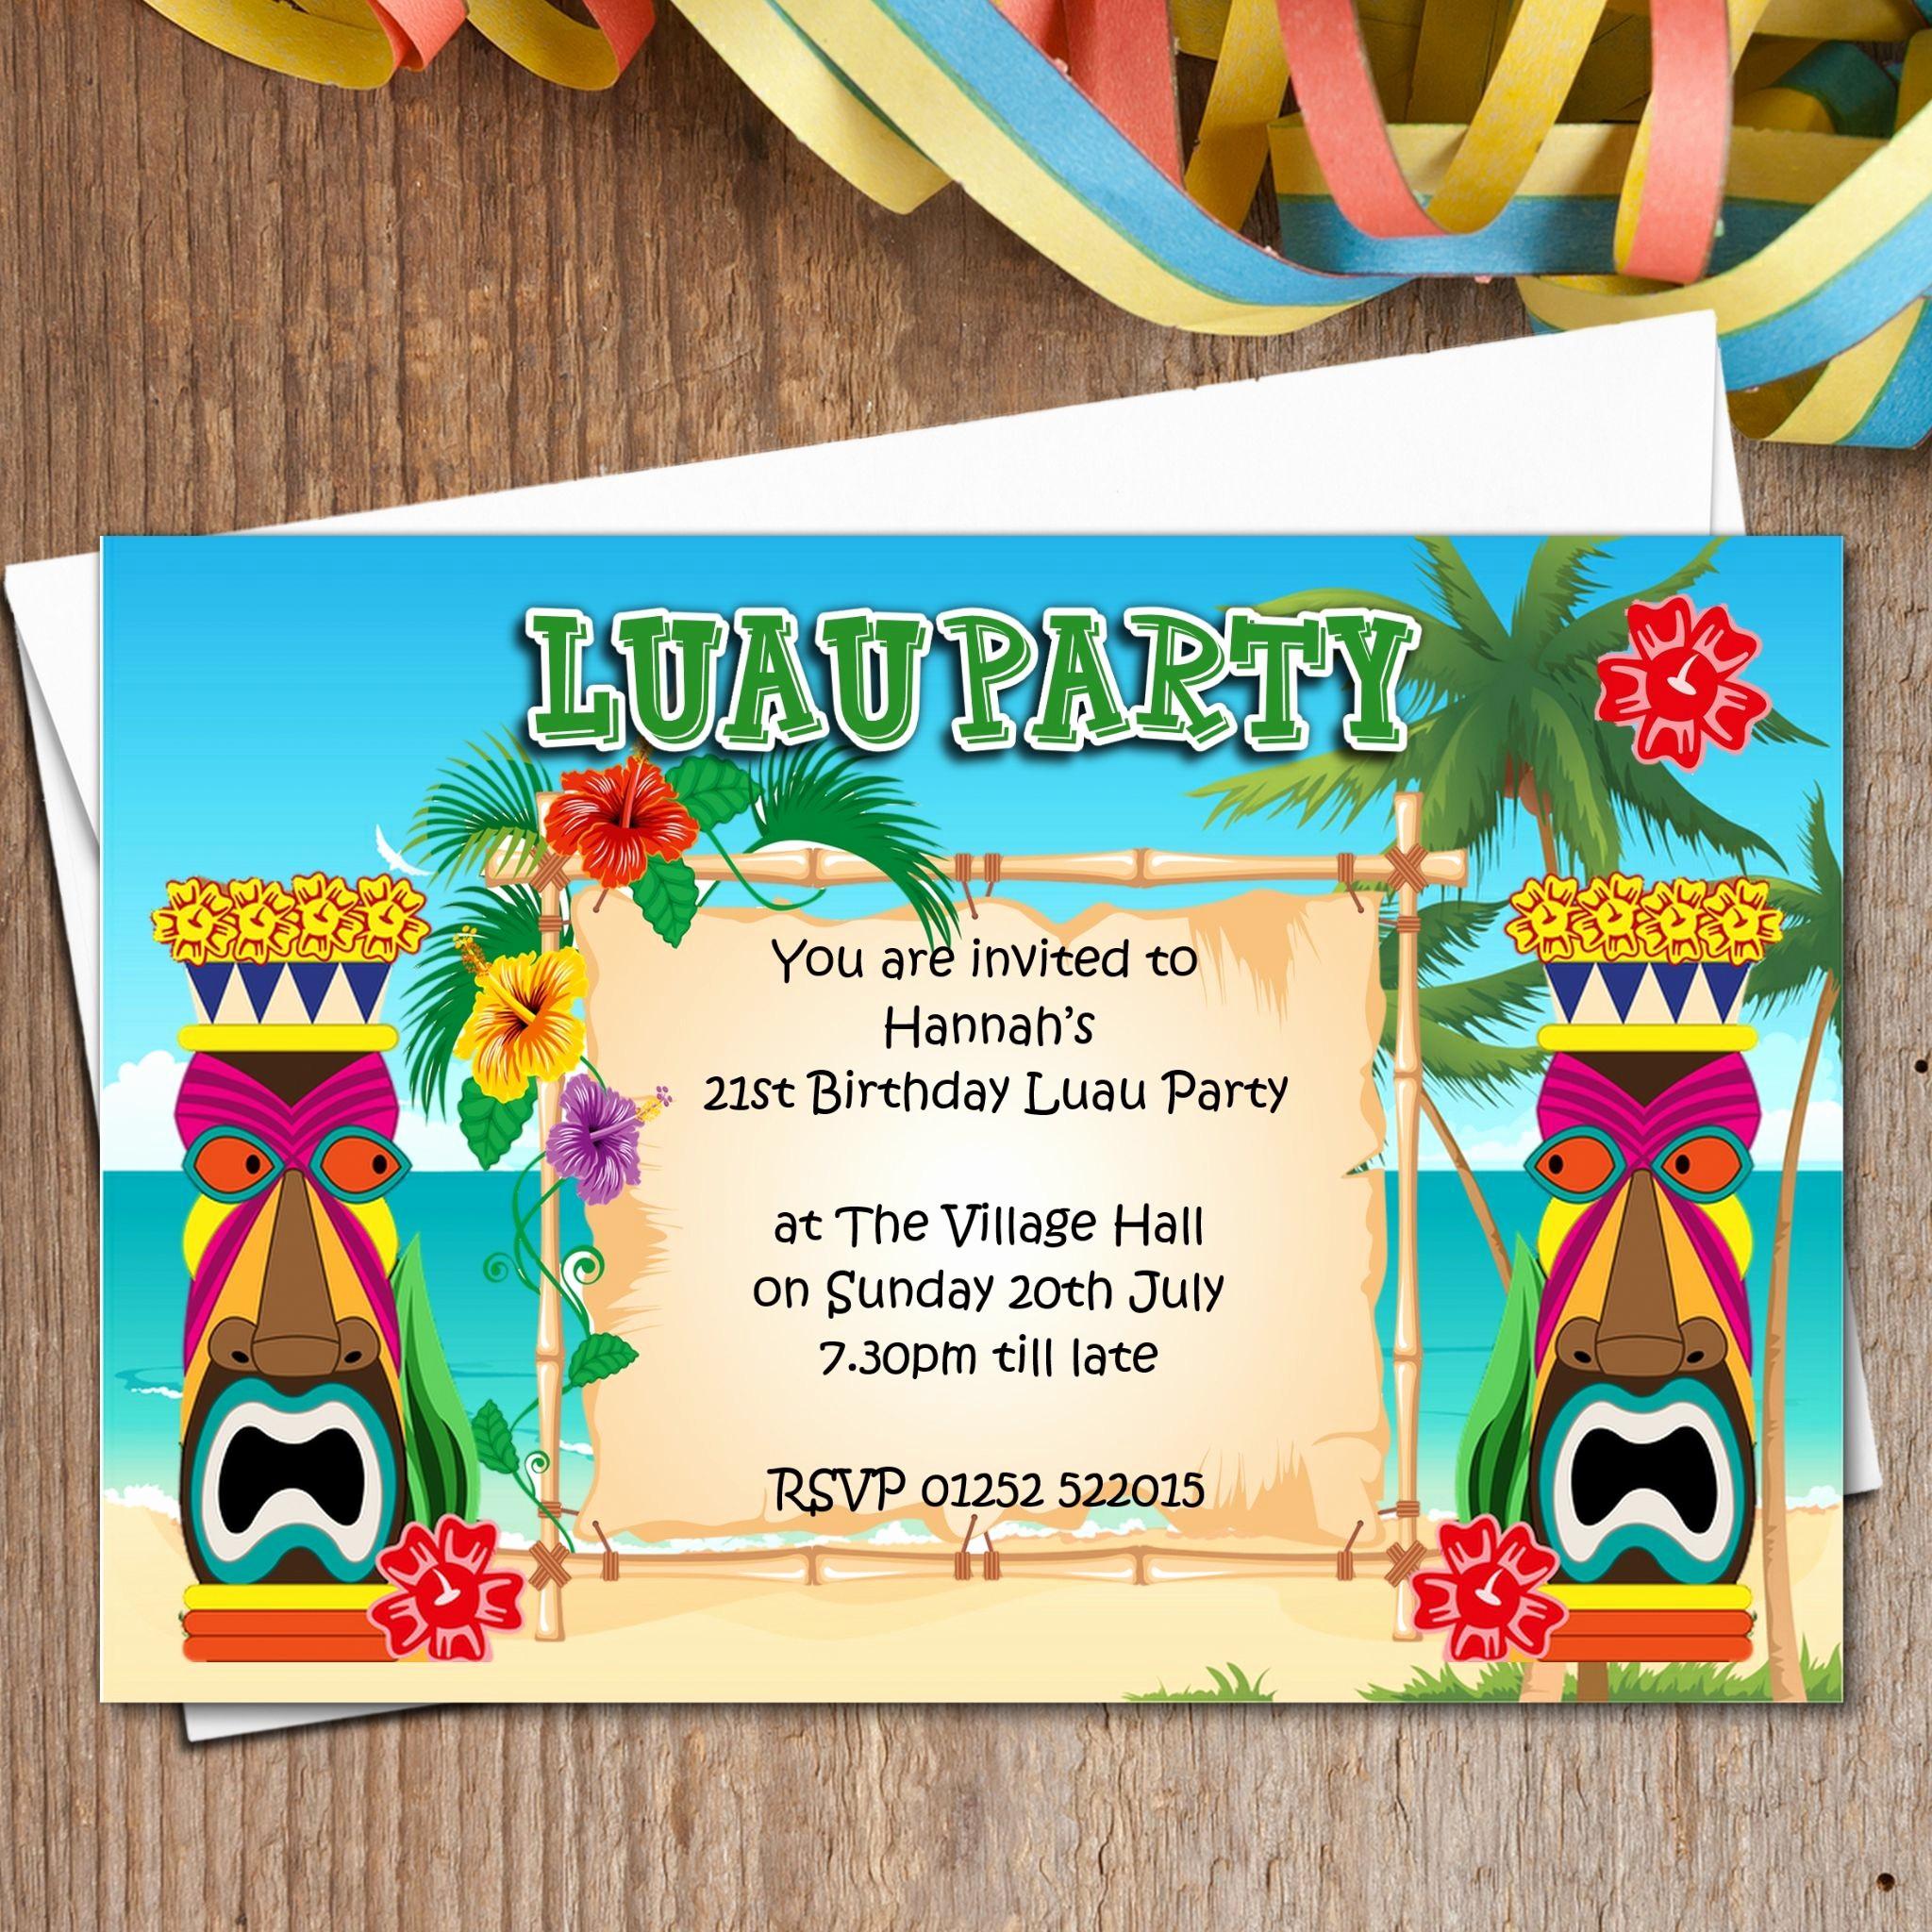 Hawaiian themed Invitation Templates Free New 10 Personalised Luau Hawaii Party Invitations N165